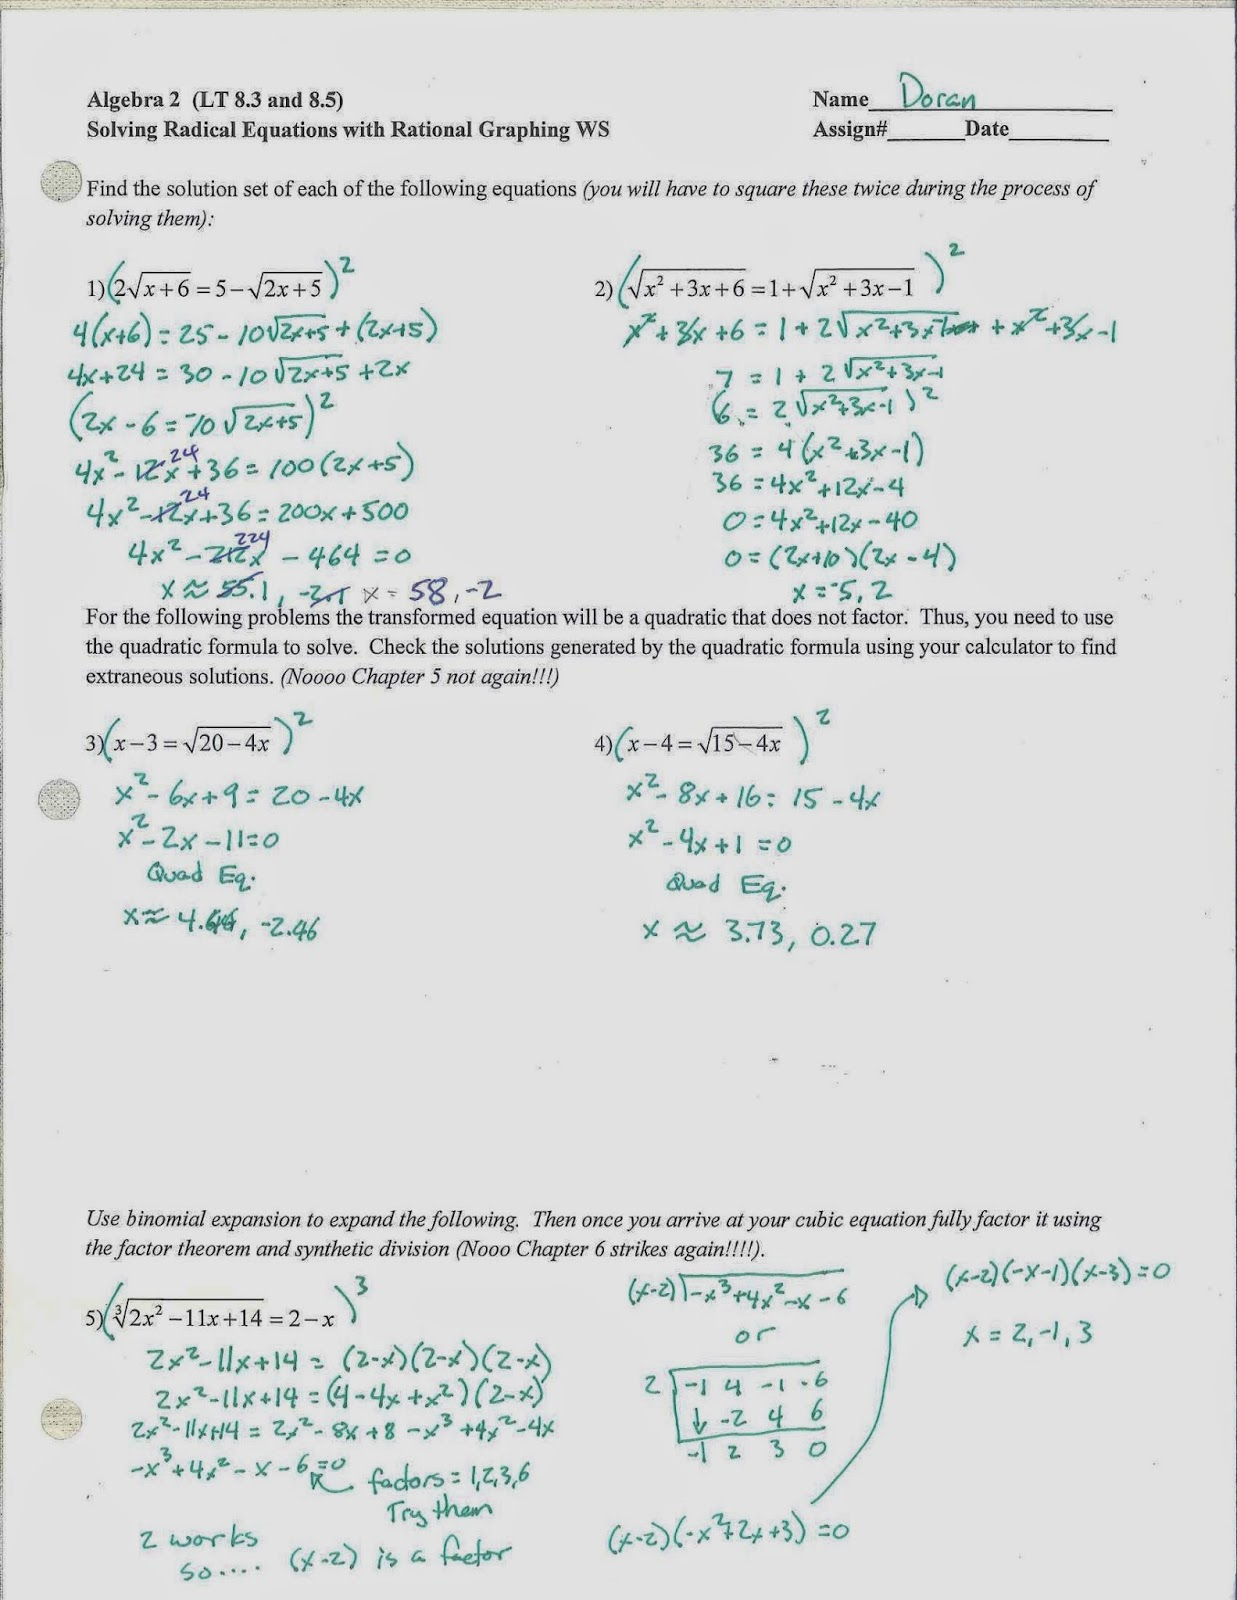 Mr Doran S Algebra 2 Unit 6 Exam Review Materials